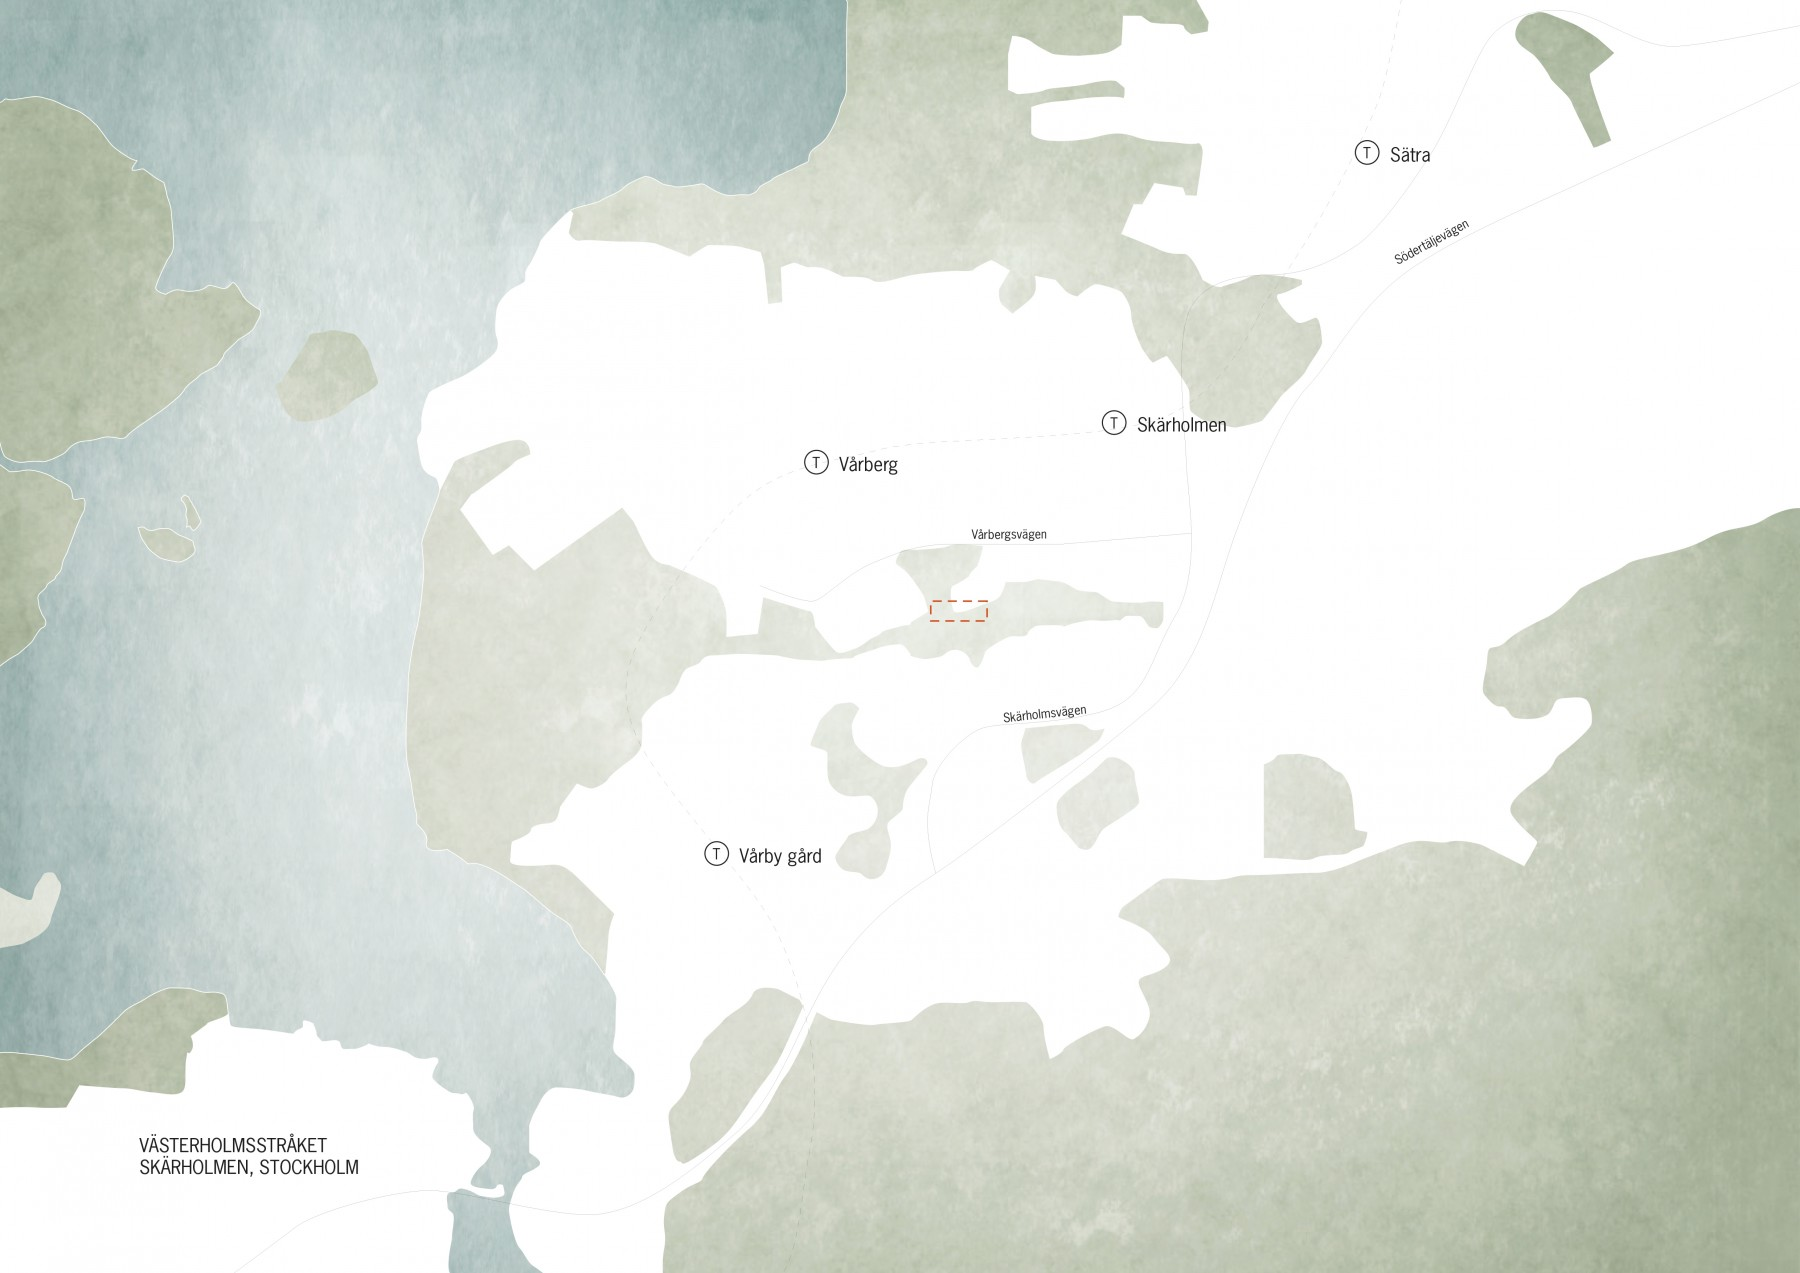 Vasterholmsstraket_LAND_2014_karta